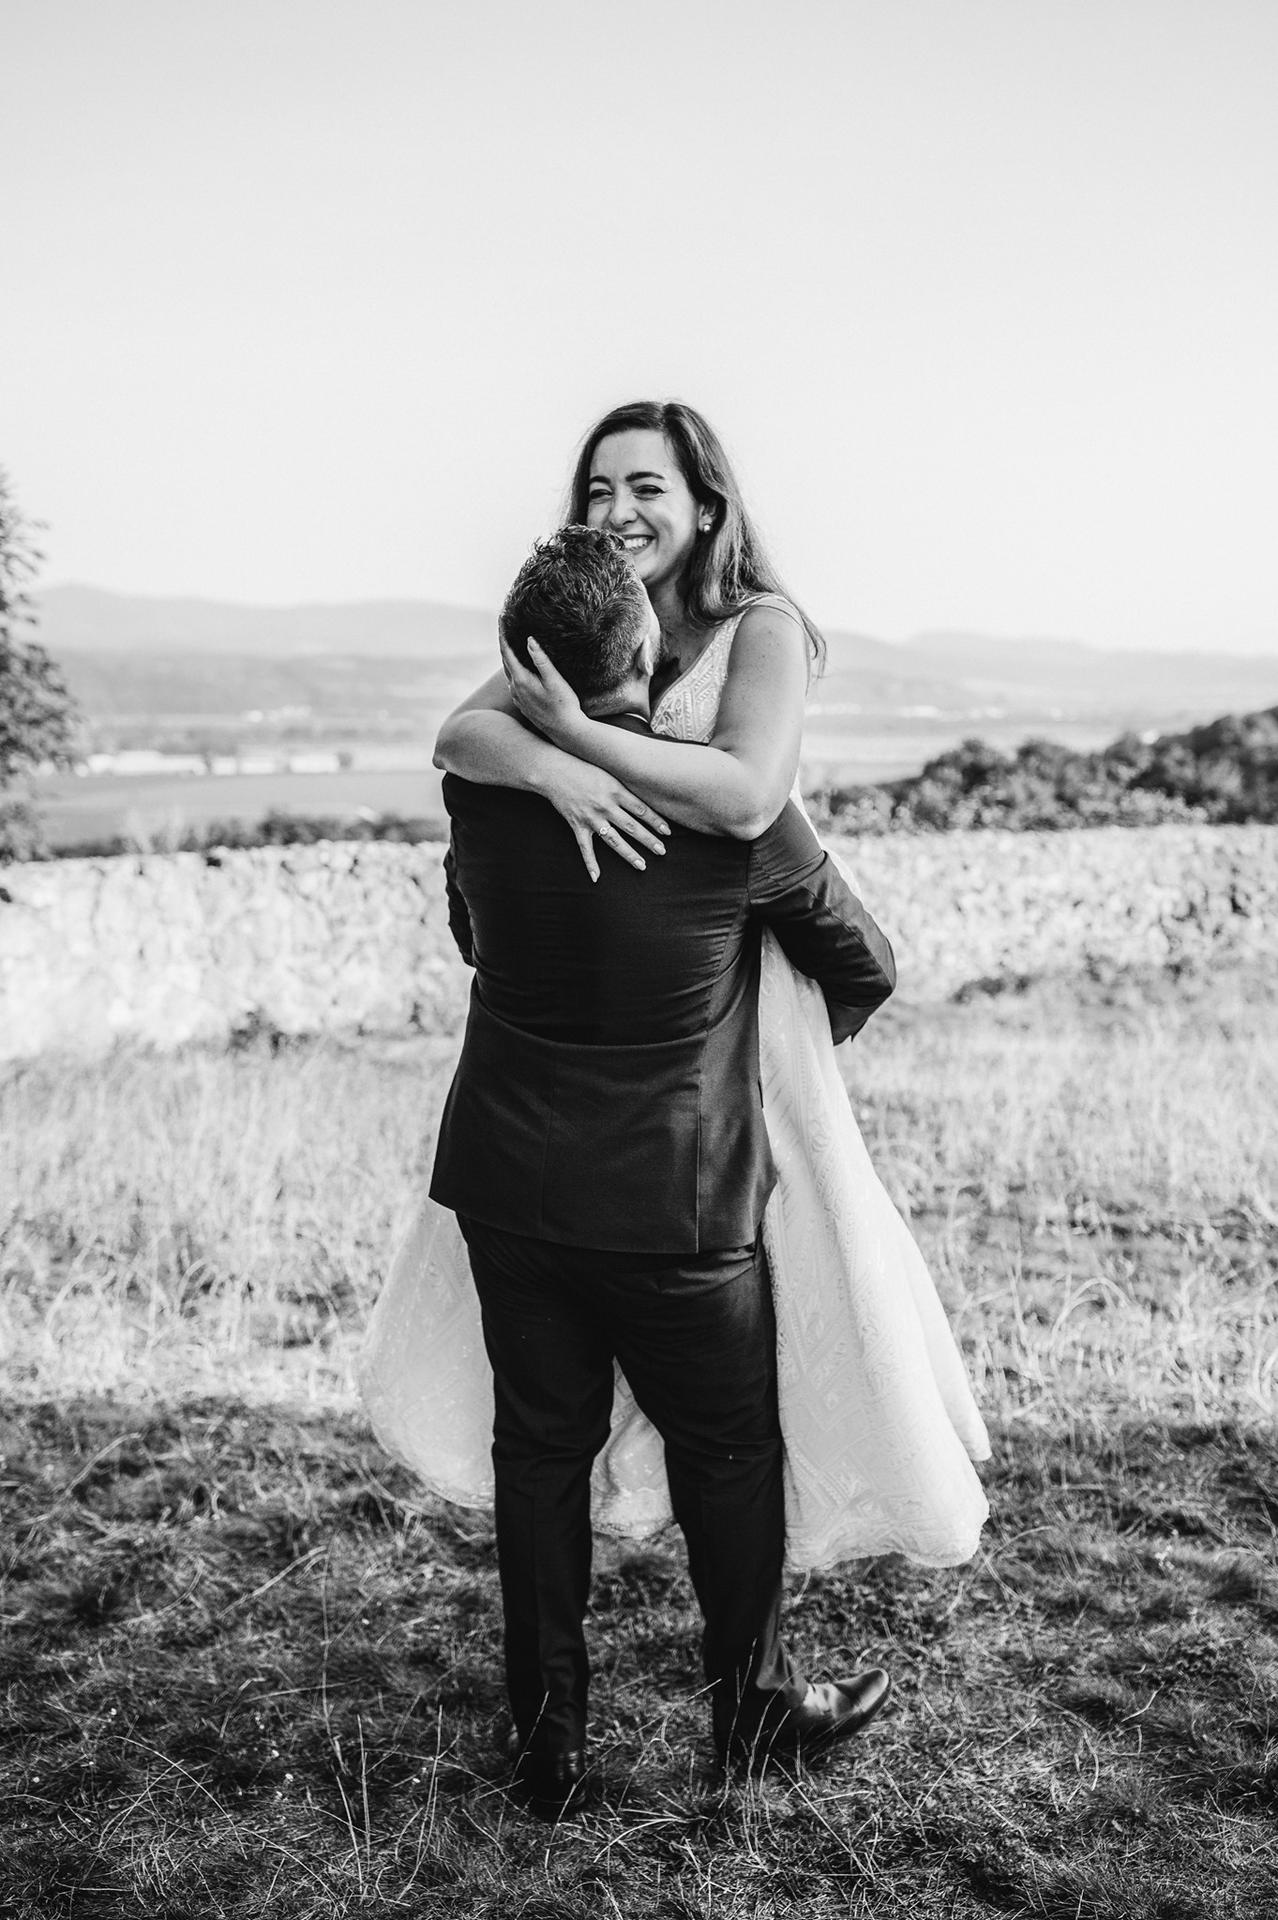 Mr. & Mrs. ❤️ - Obrázok č. 2